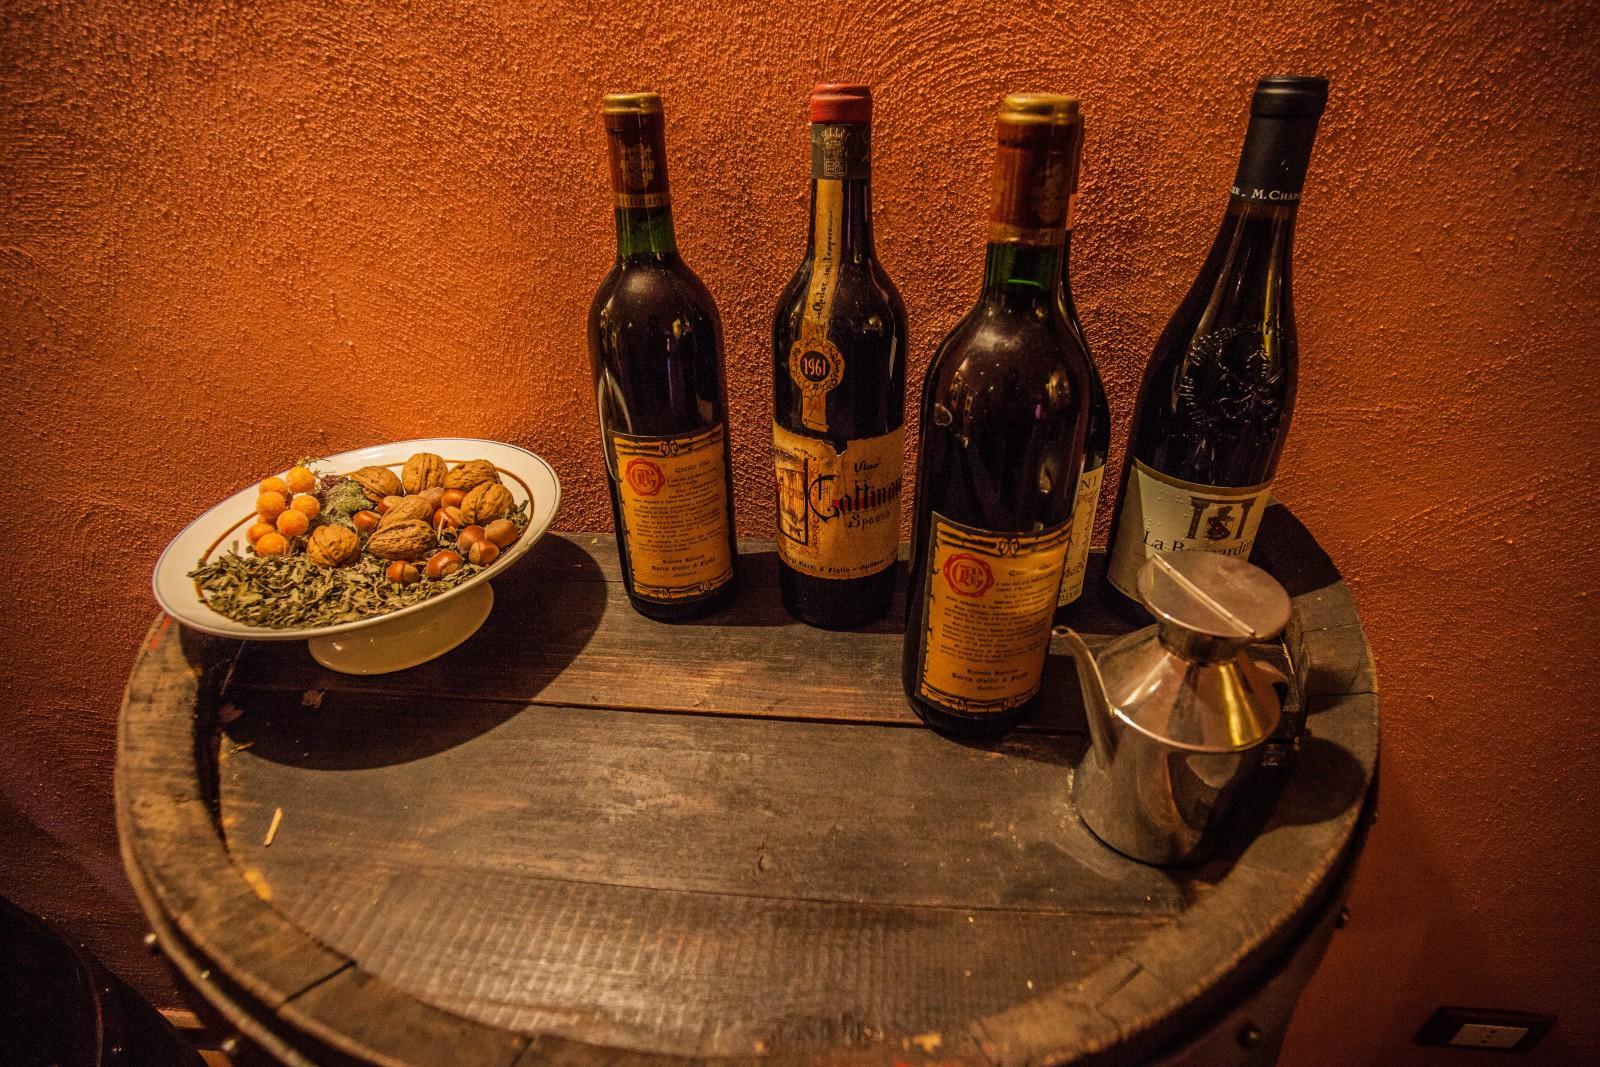 Italian Wine Bottles at Appliance City